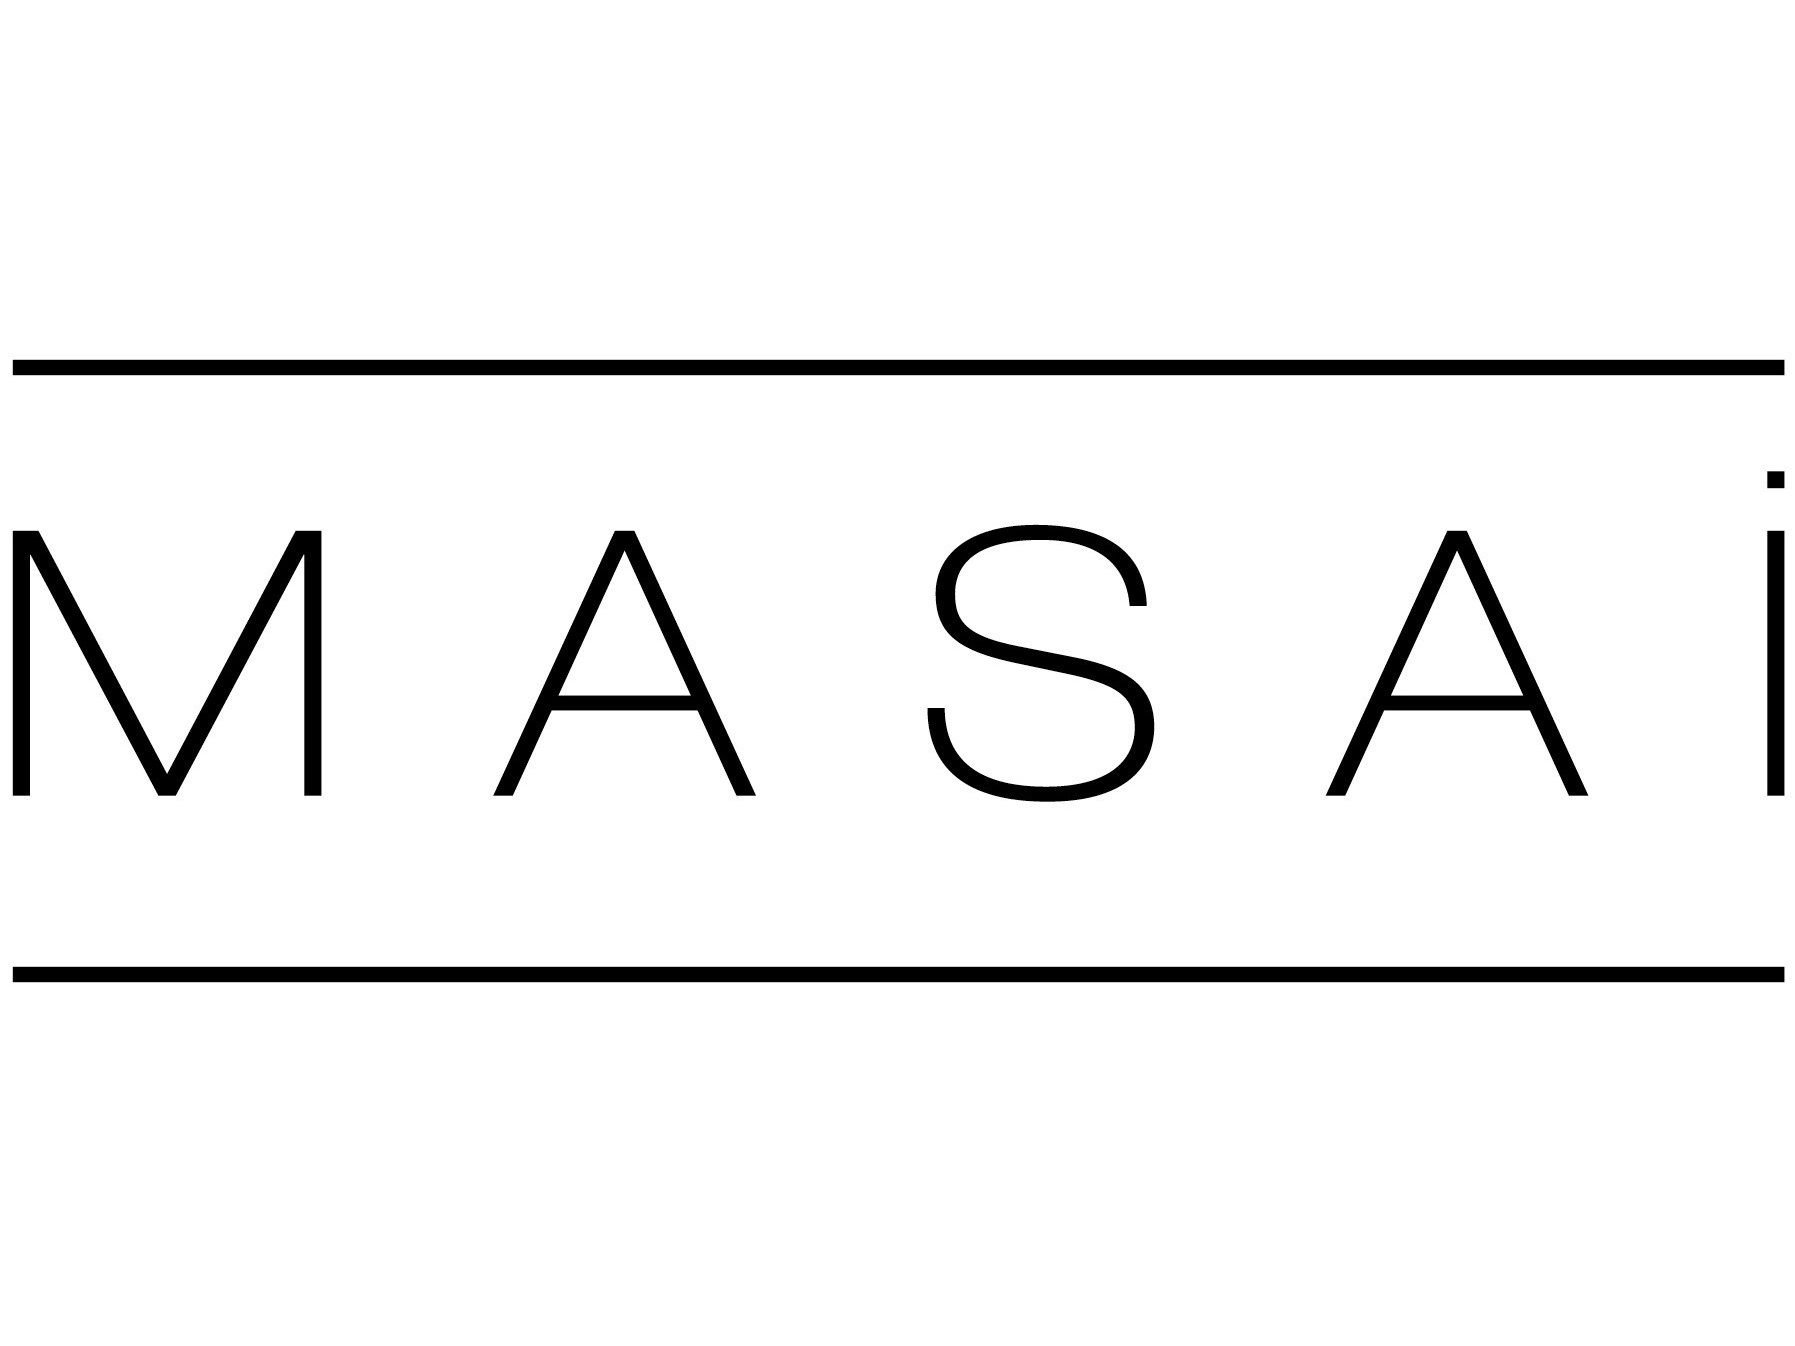 masai_logo_black_15cm_4x3.jpg